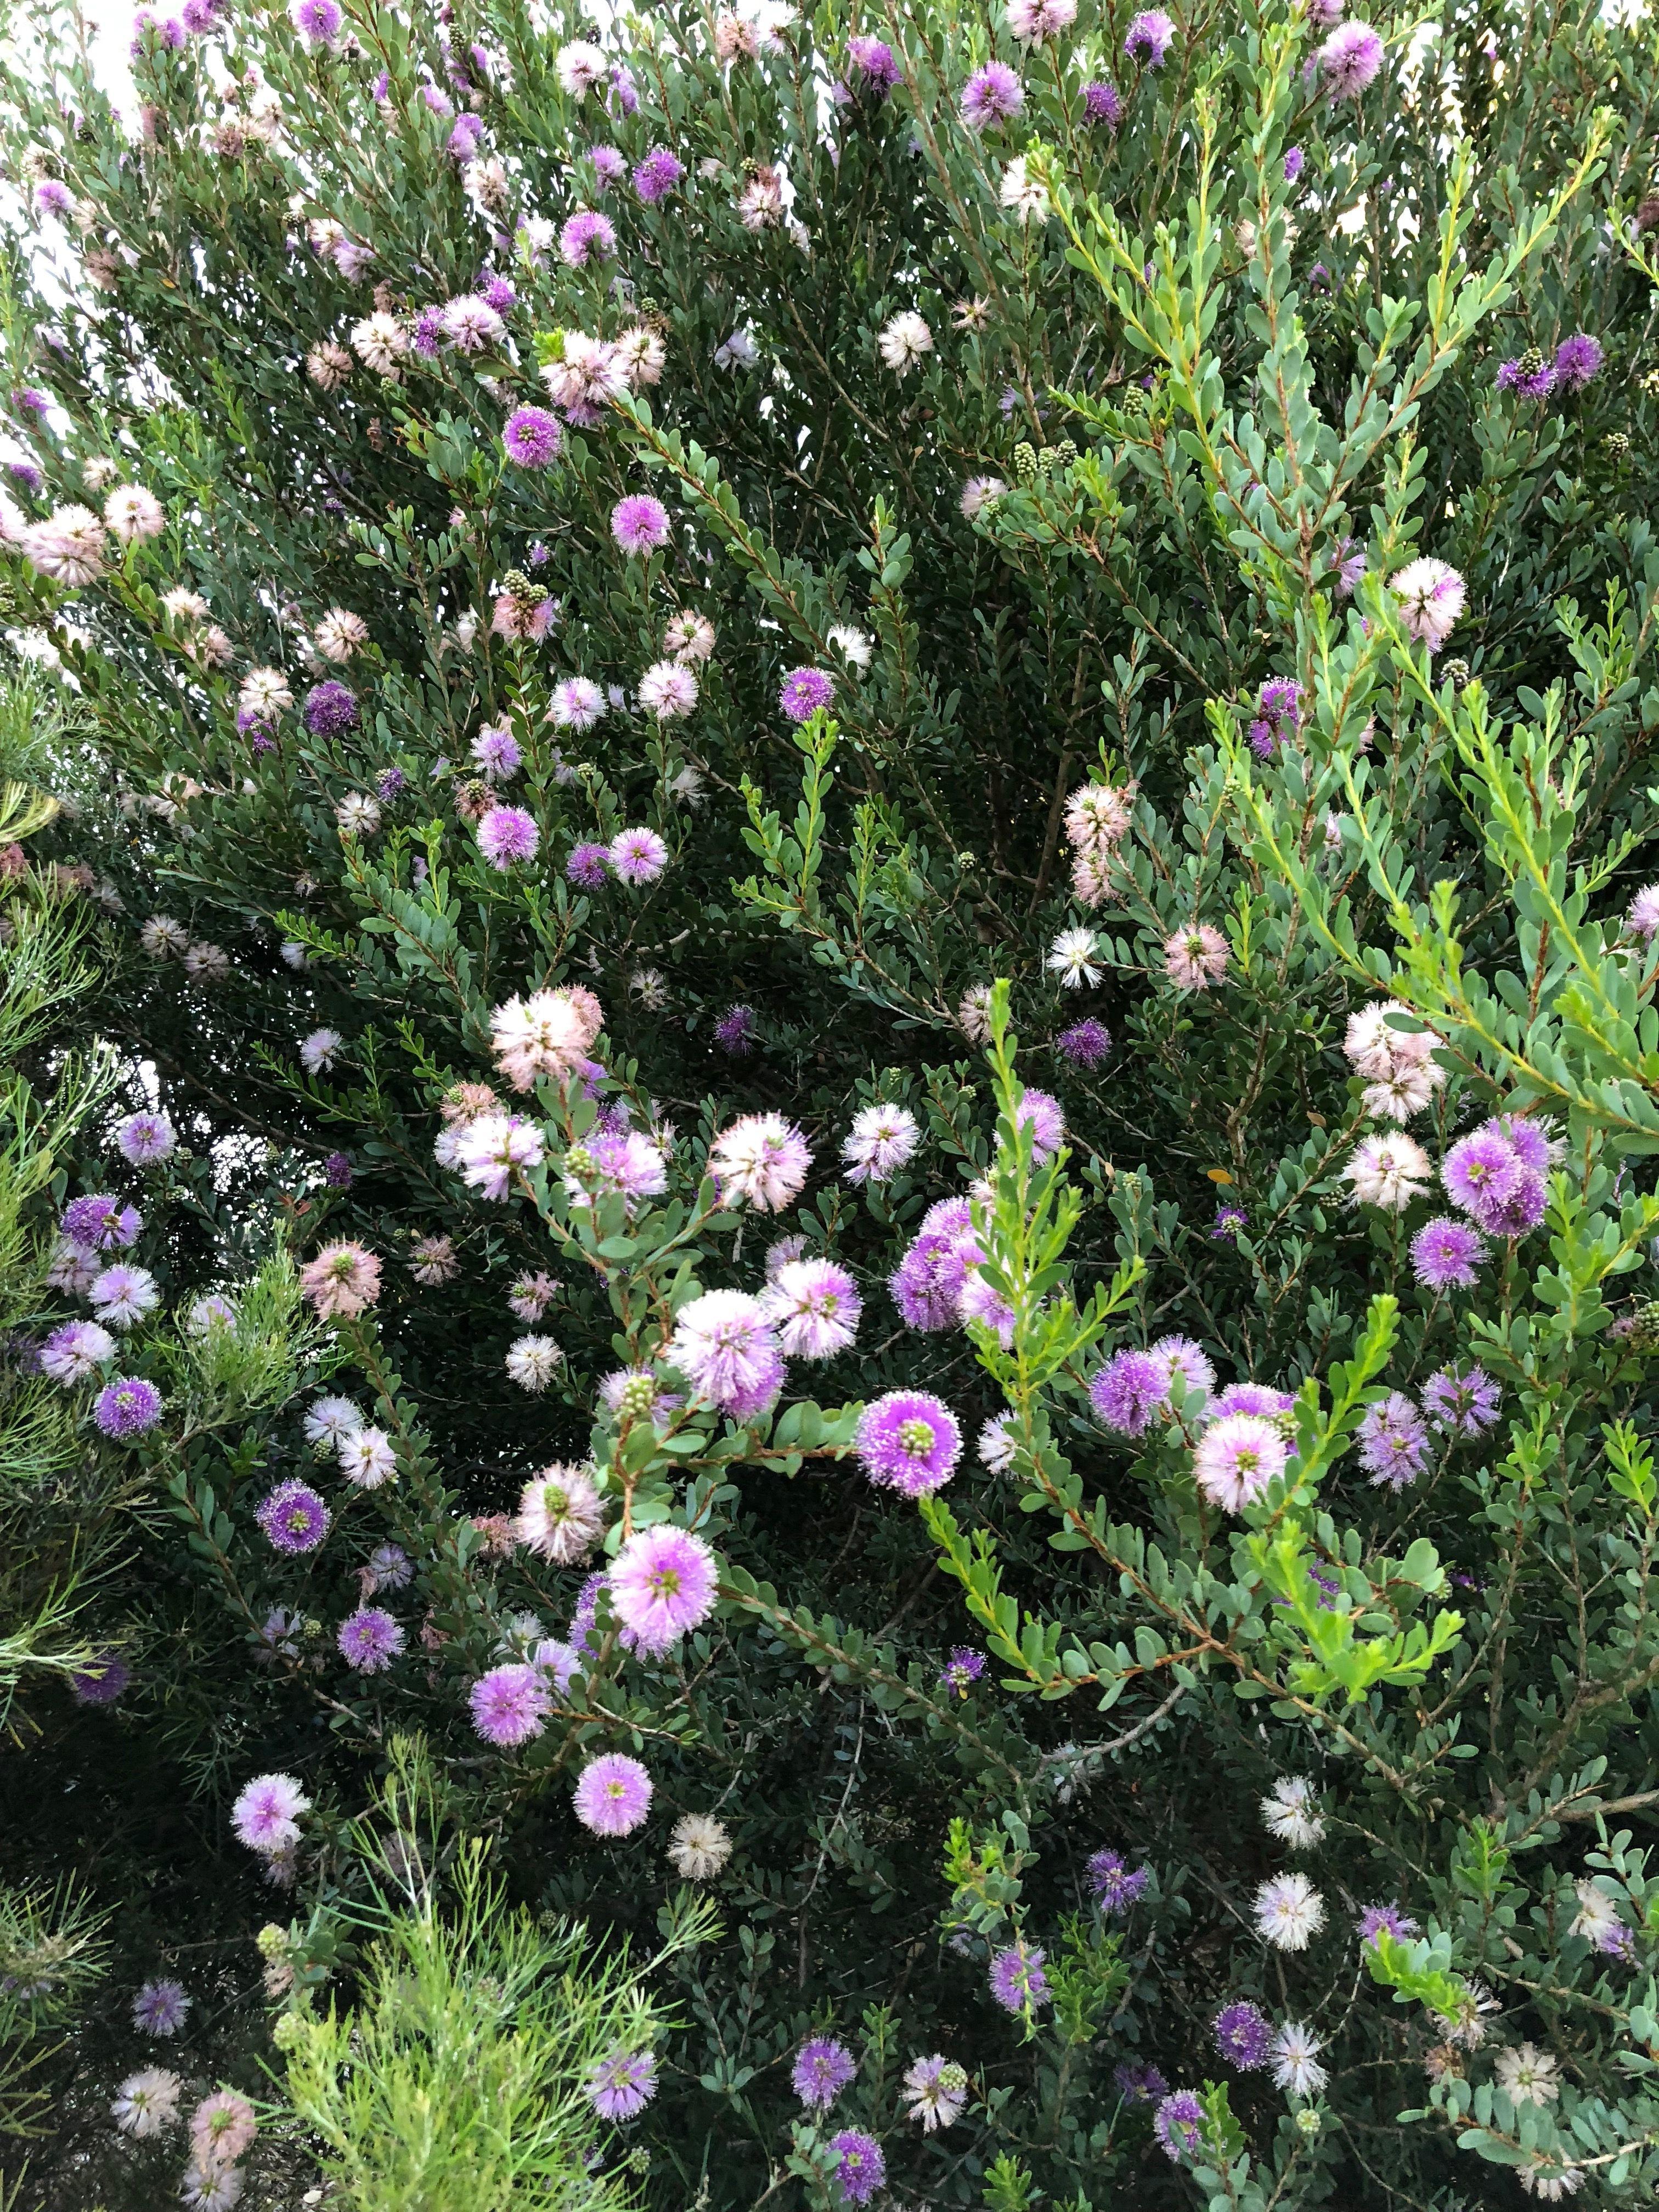 Melaleuca nesophila Pink Melaleuca Zone 9 Flower color lavender to rose pink 15 20 H & W